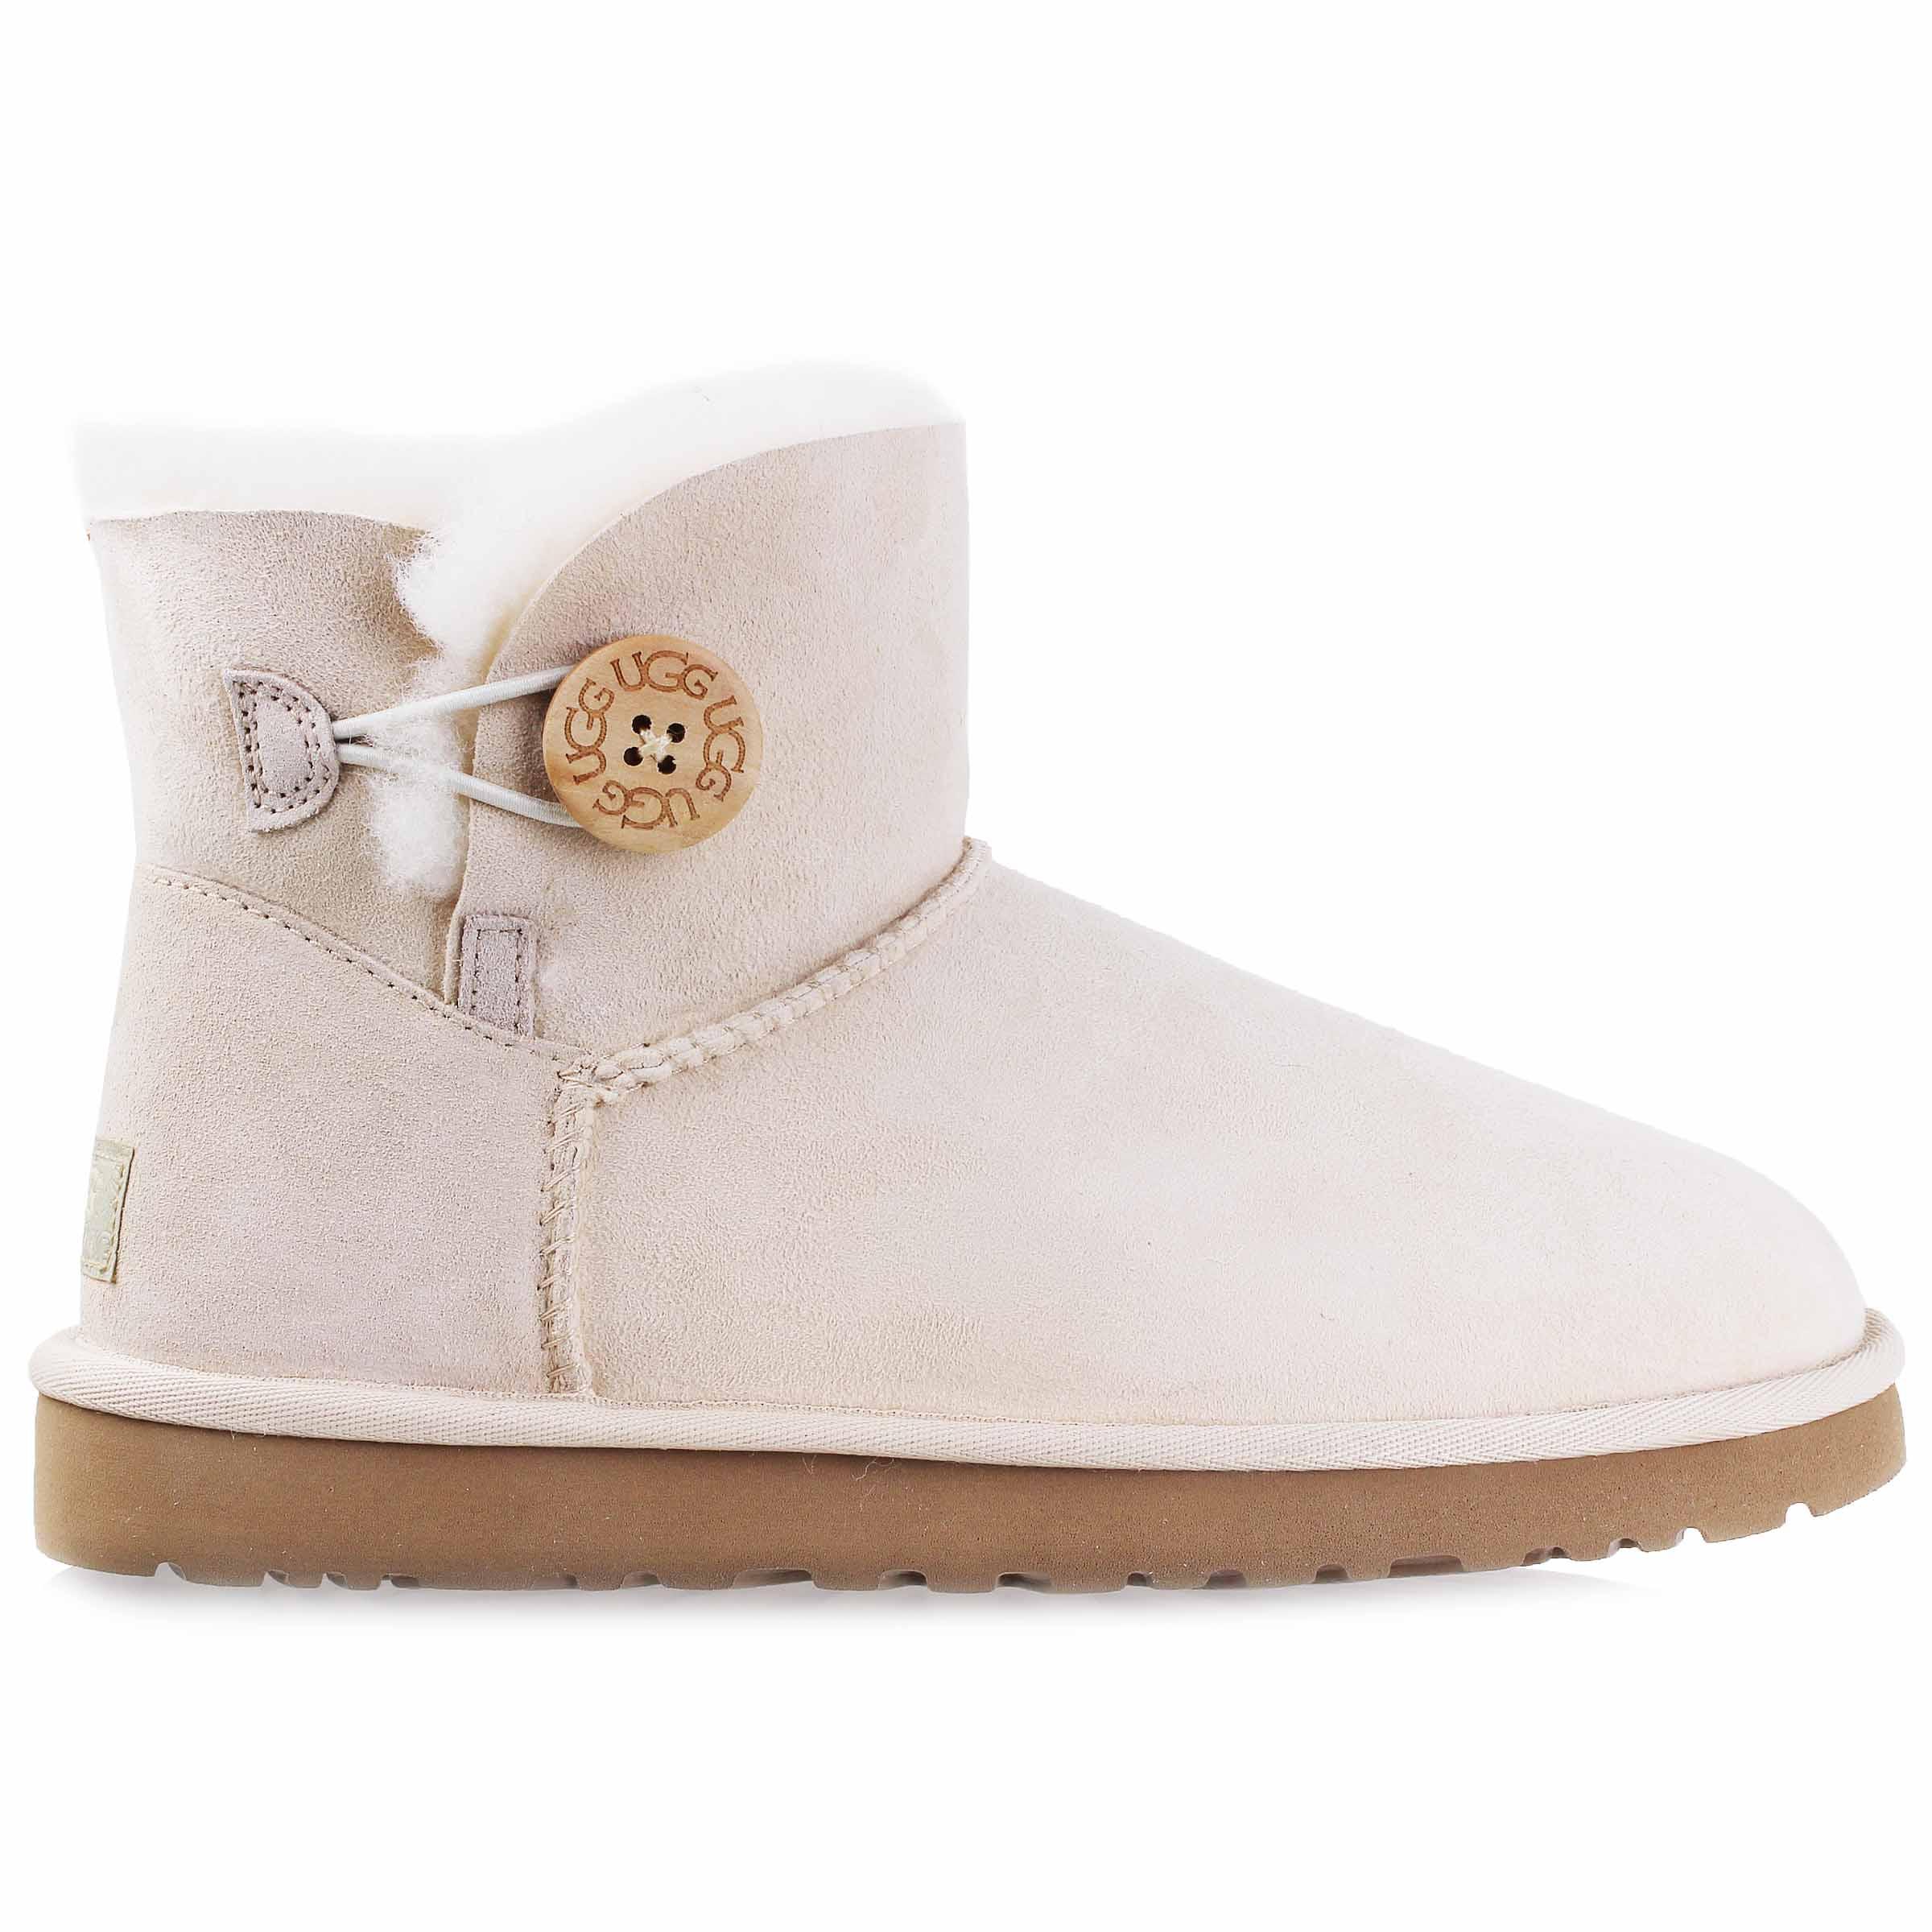 Ugg Femmes Mini Bailey Button Button Bottes Chaussures 4697 3352 W Bailey FSNW Fresh Snow | fd04198 - e7z.info